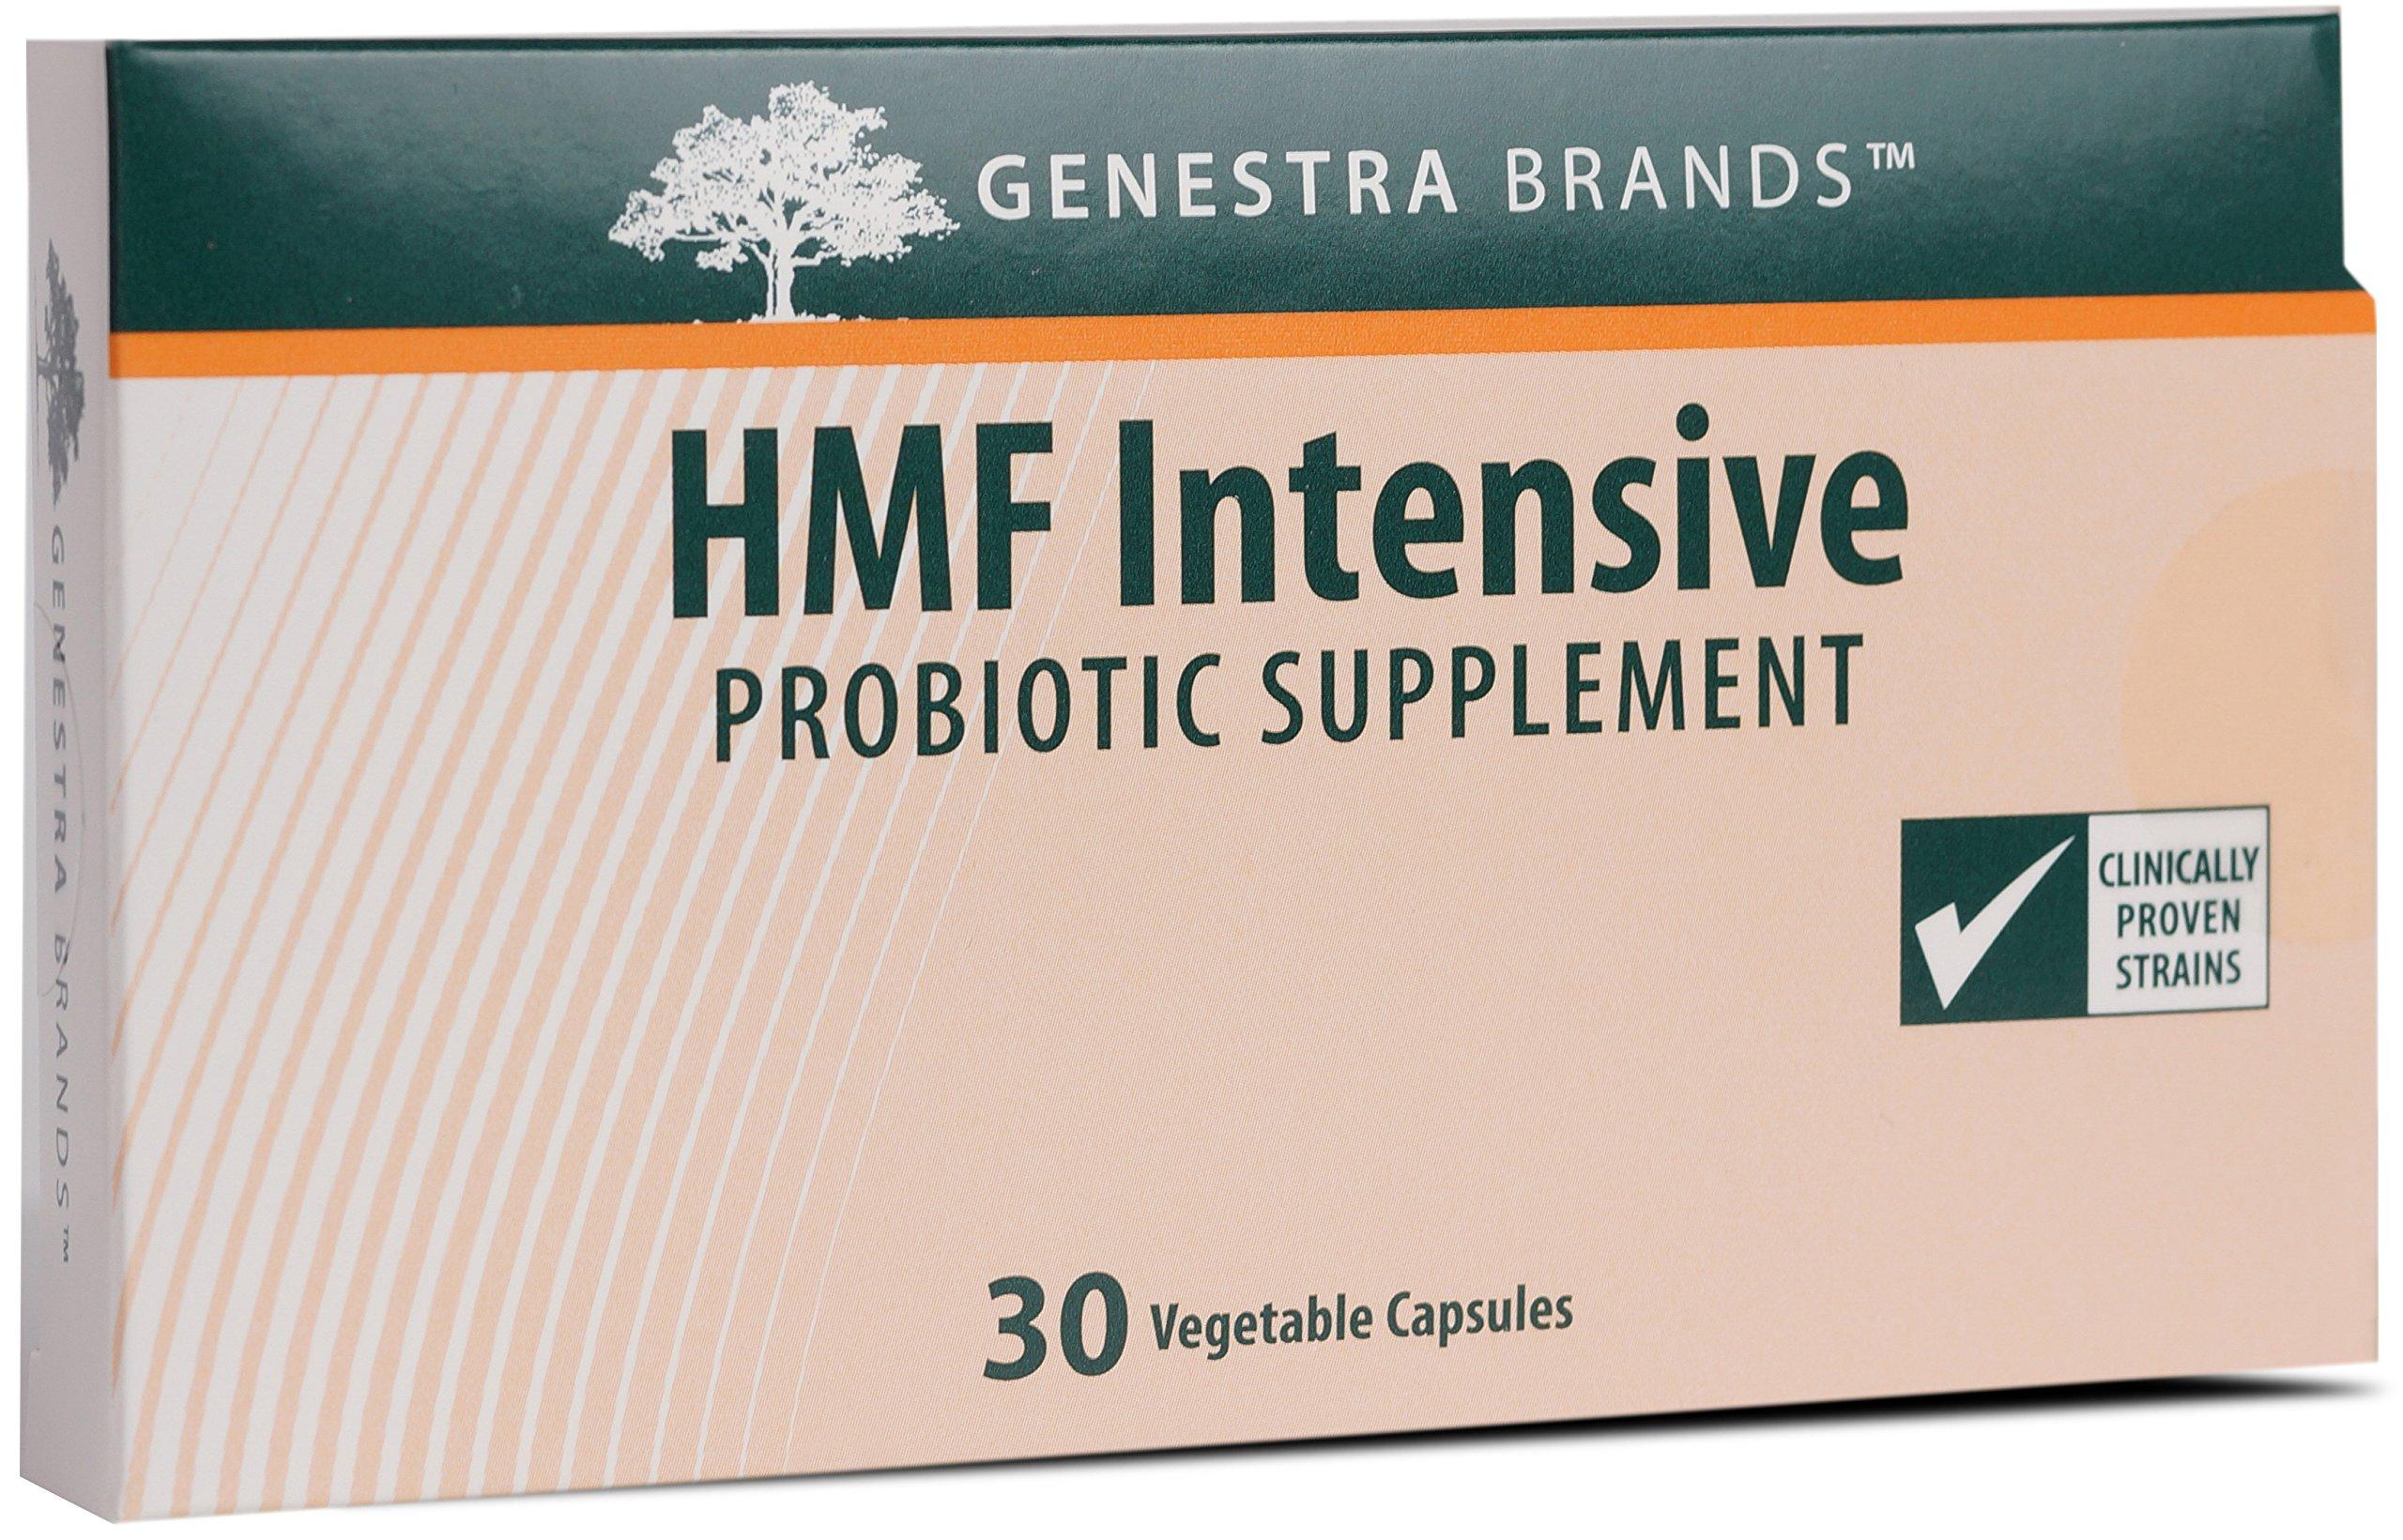 Genestra Brands - HMF Intensive - Four Strains of Probiotics to Promote GI Health* - 30 Capsules